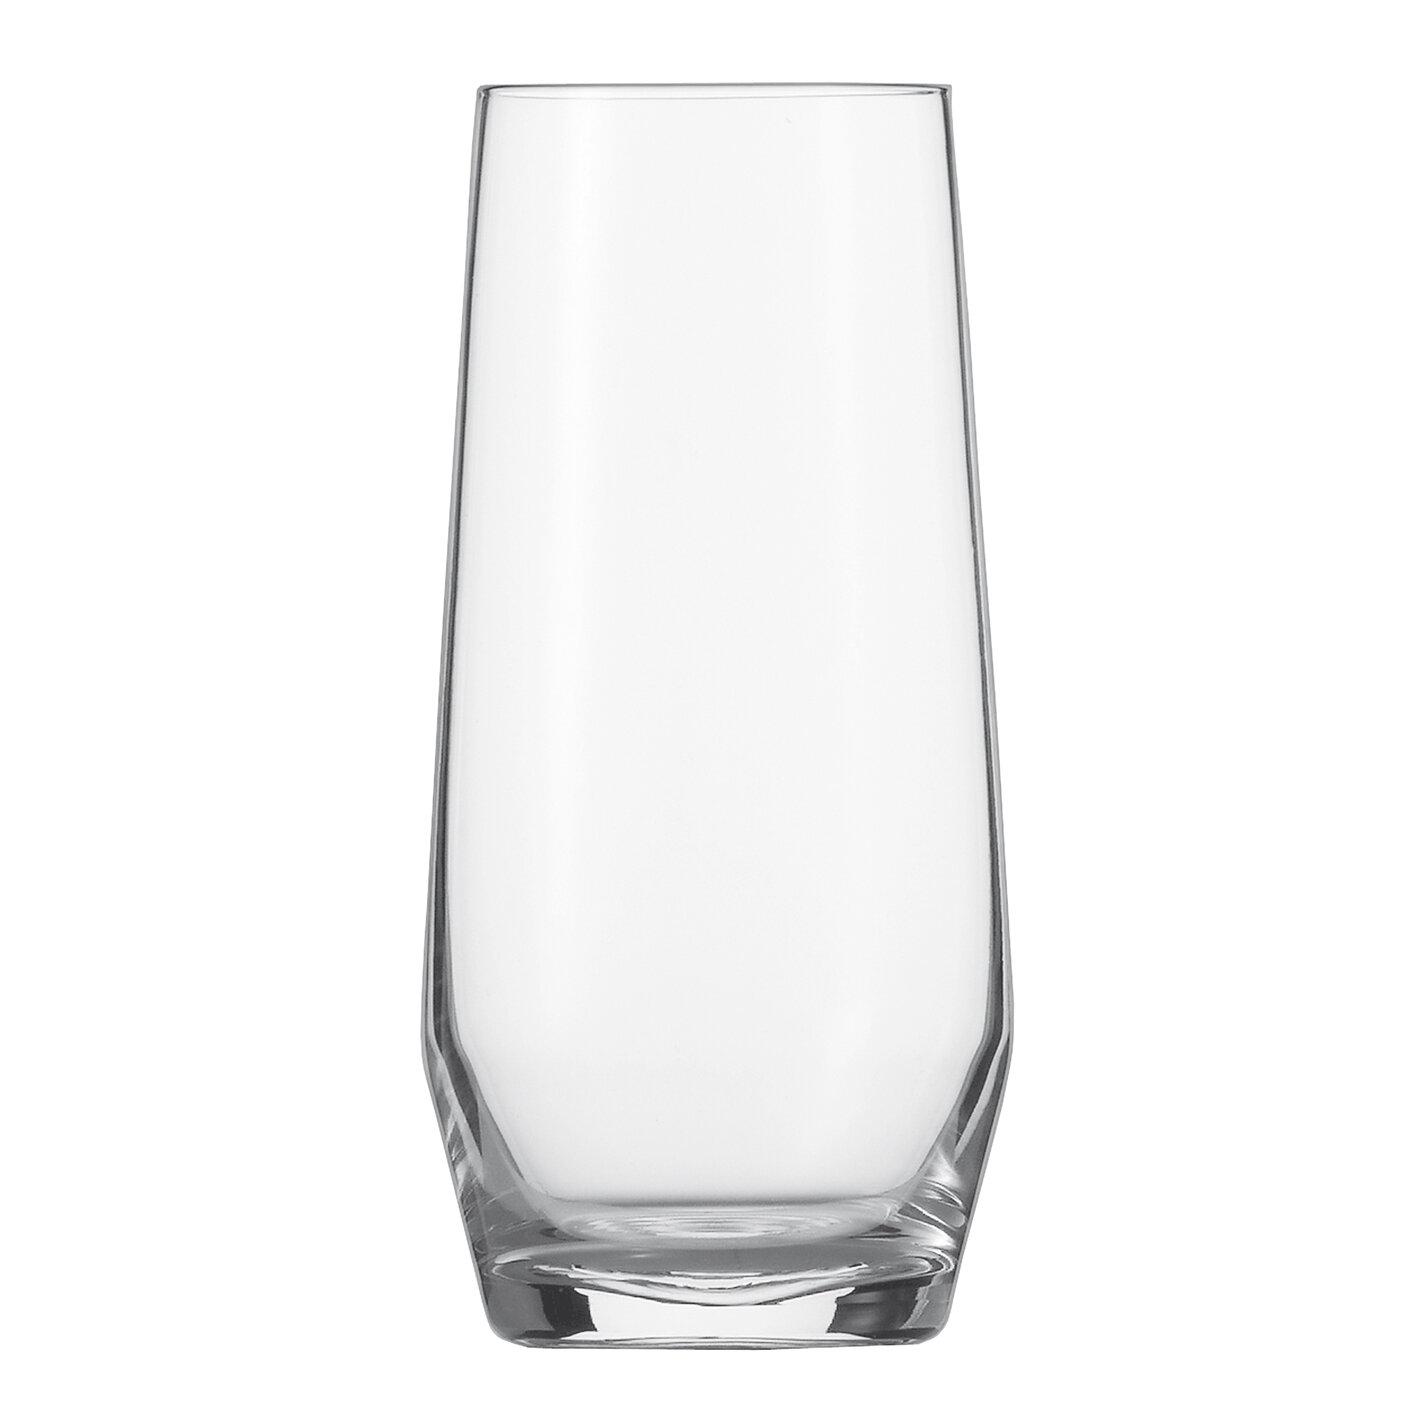 Drinking Glass Set of 6 Schott Zwiesel Pure 12 oz